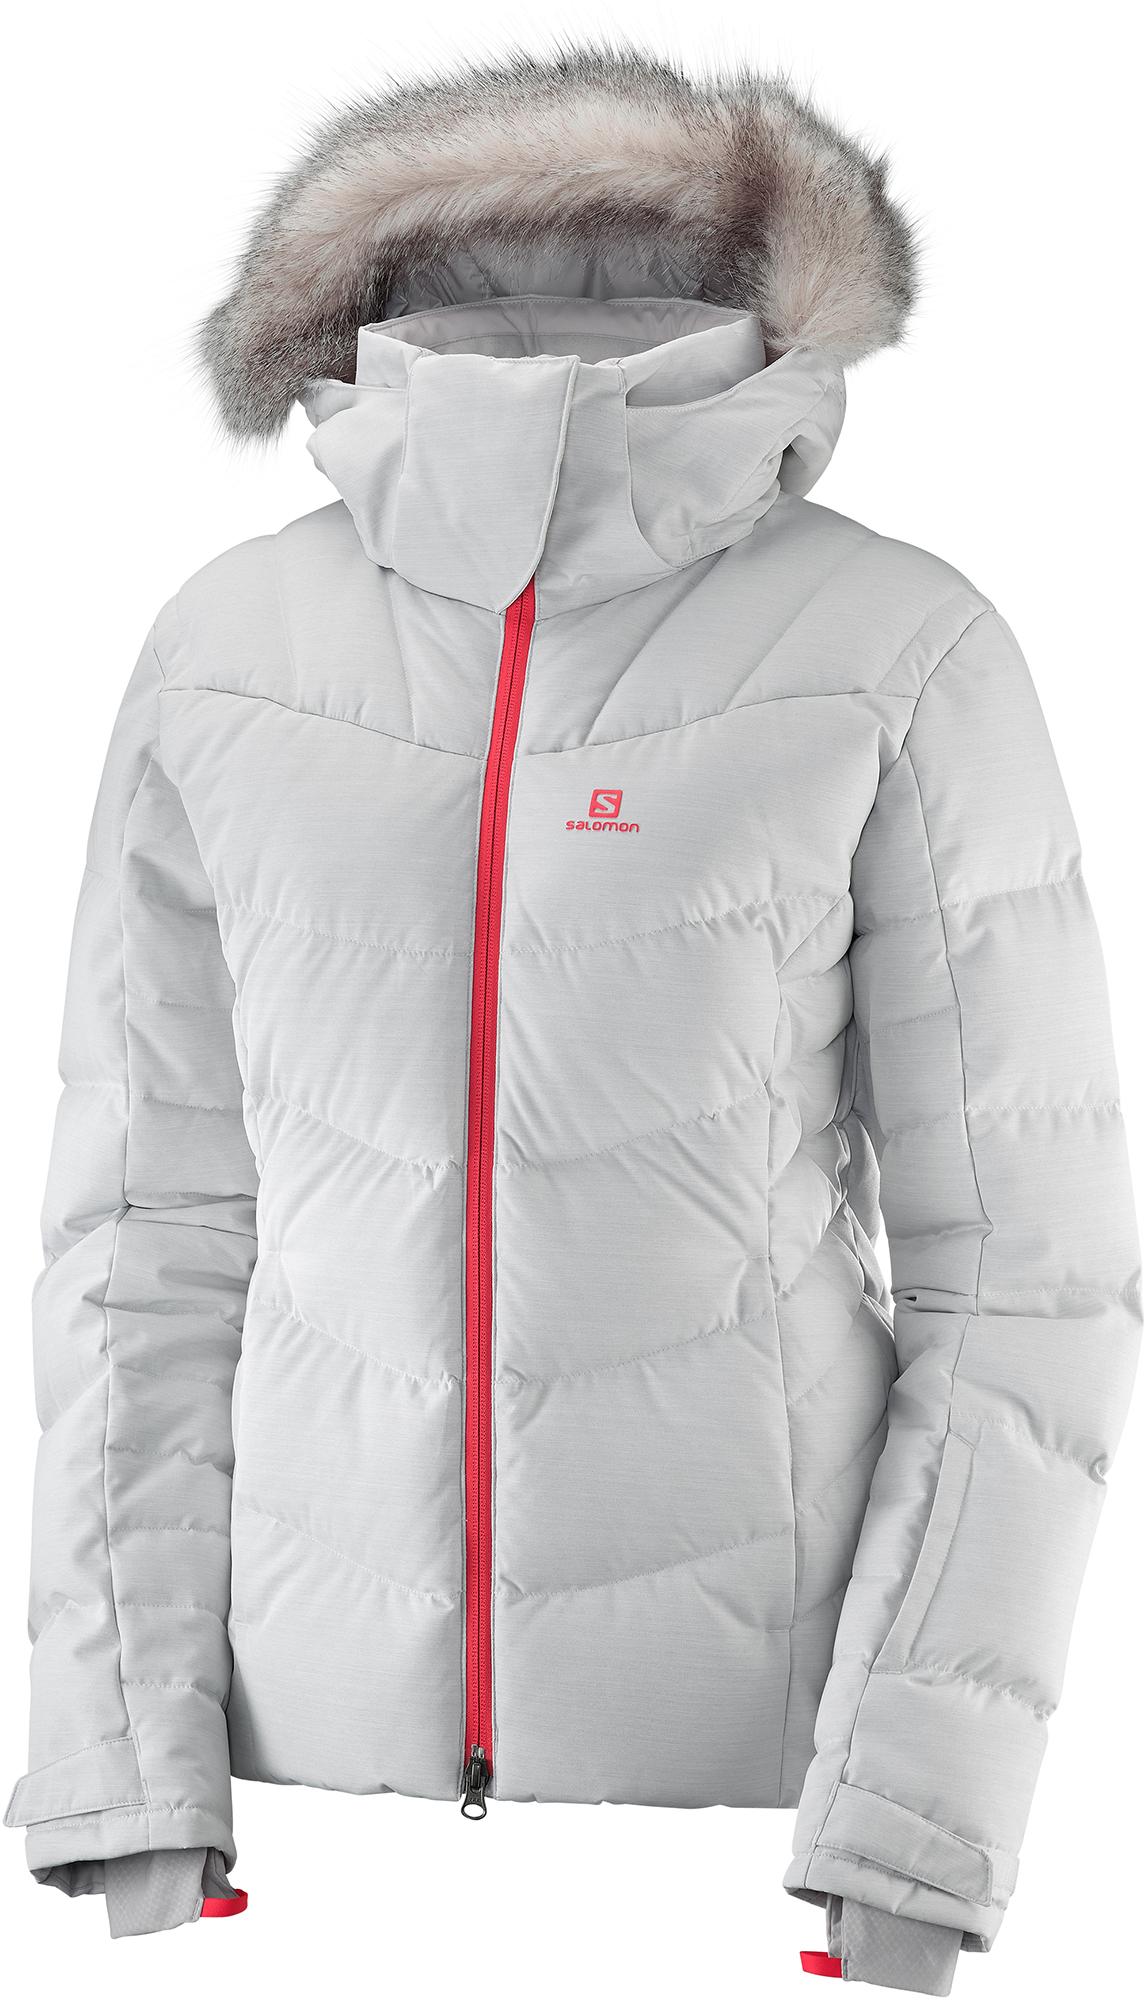 Salomon Куртка пуховая женская Salomon Icetown, размер 54